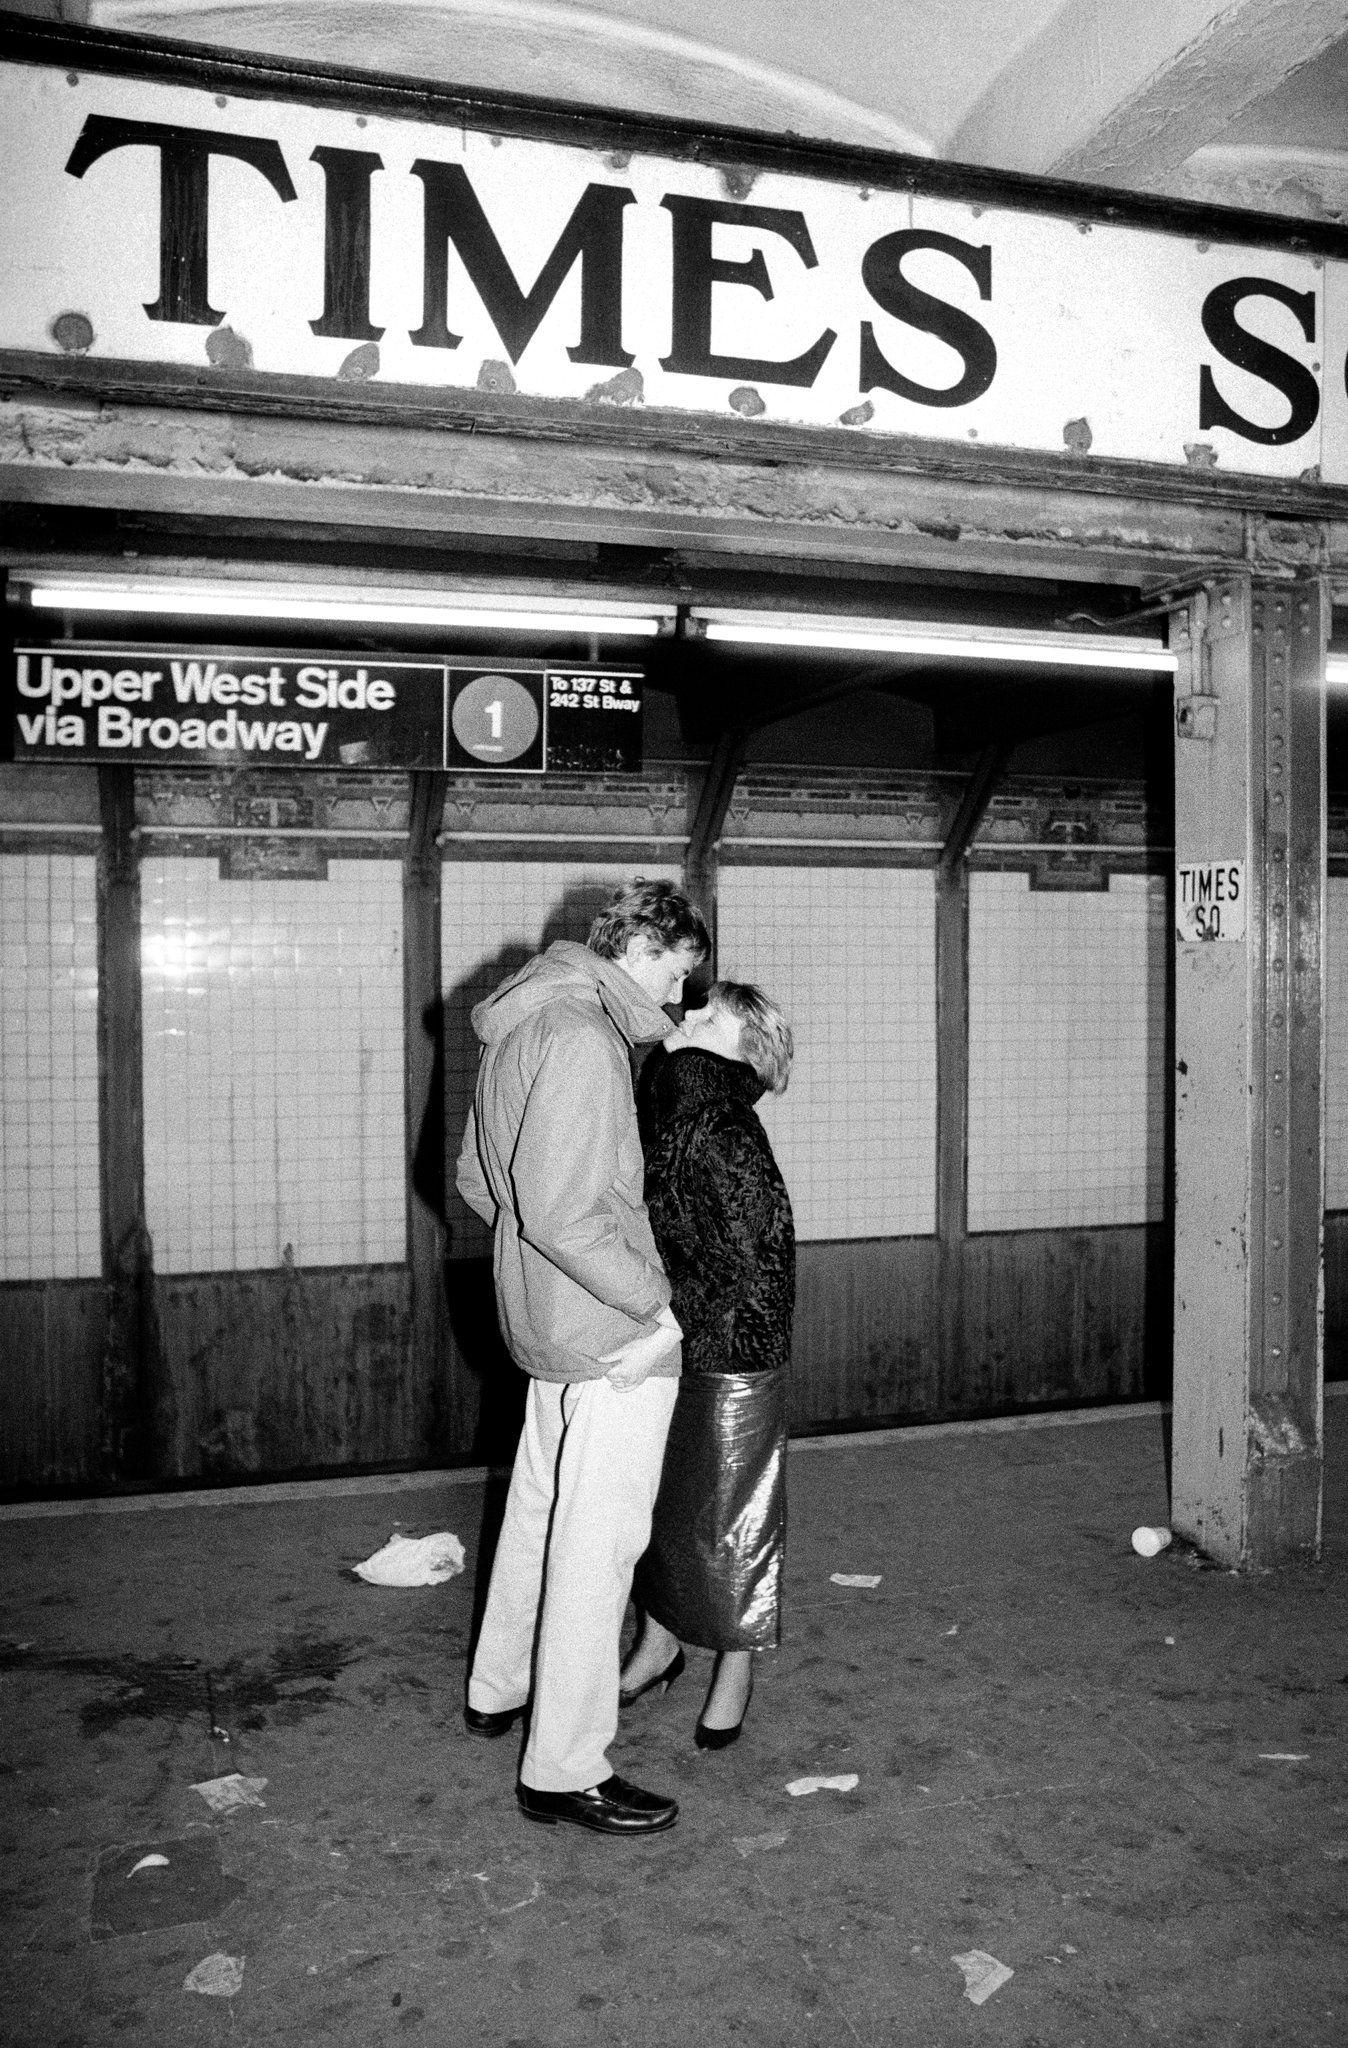 newyearseveevents 1986 TimesSquare newyearseveparties